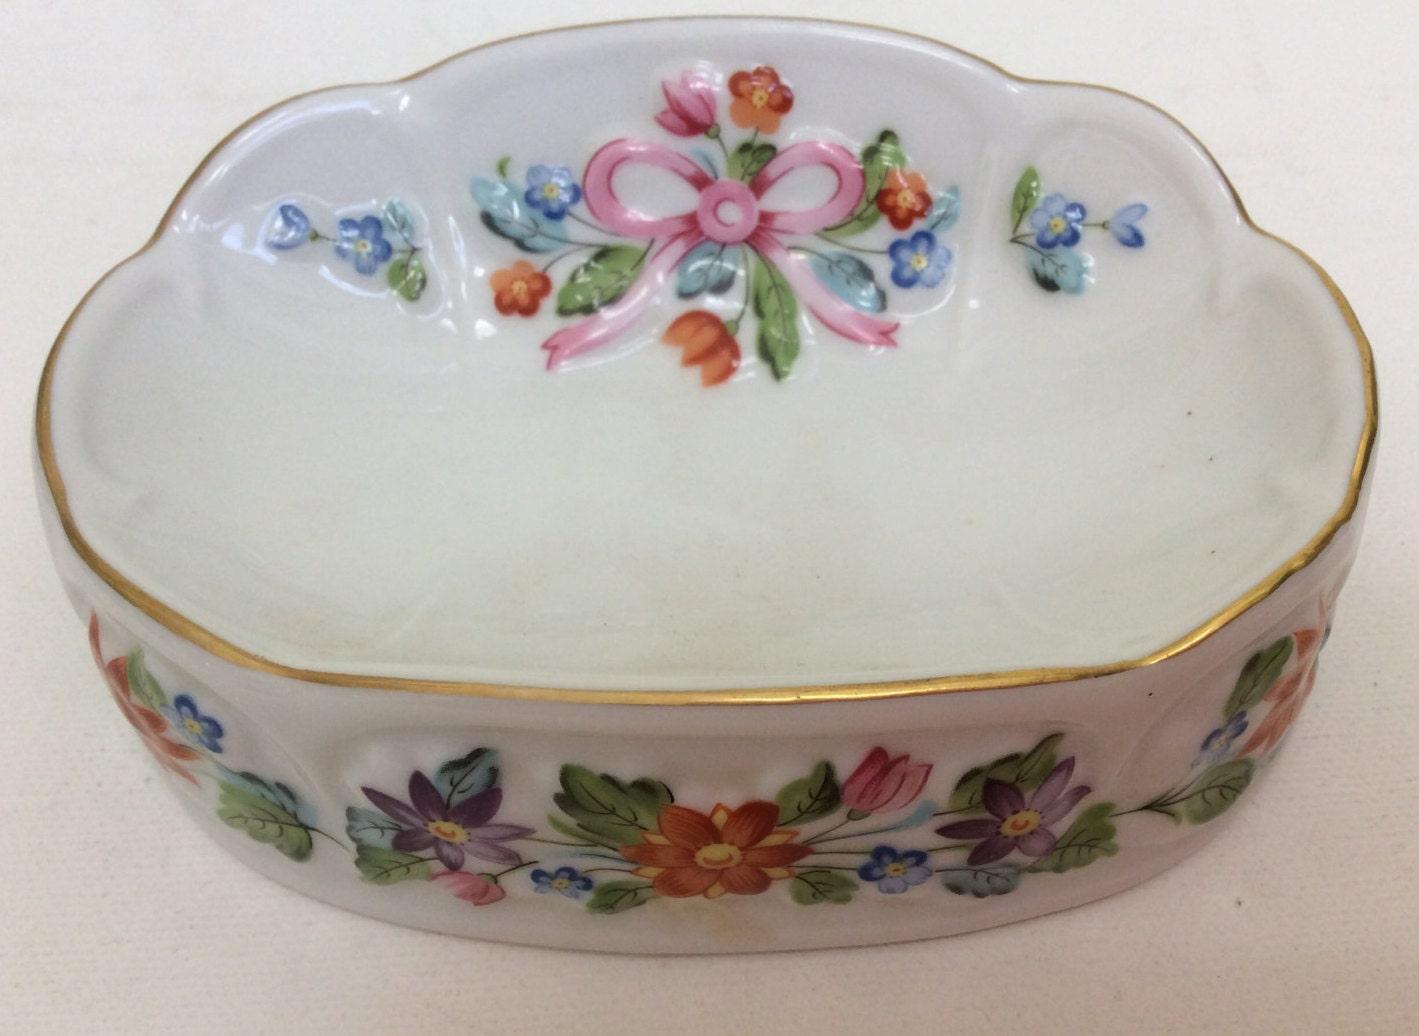 Vintage White Ceramic Floral Dish White Ceramic Soap Dish